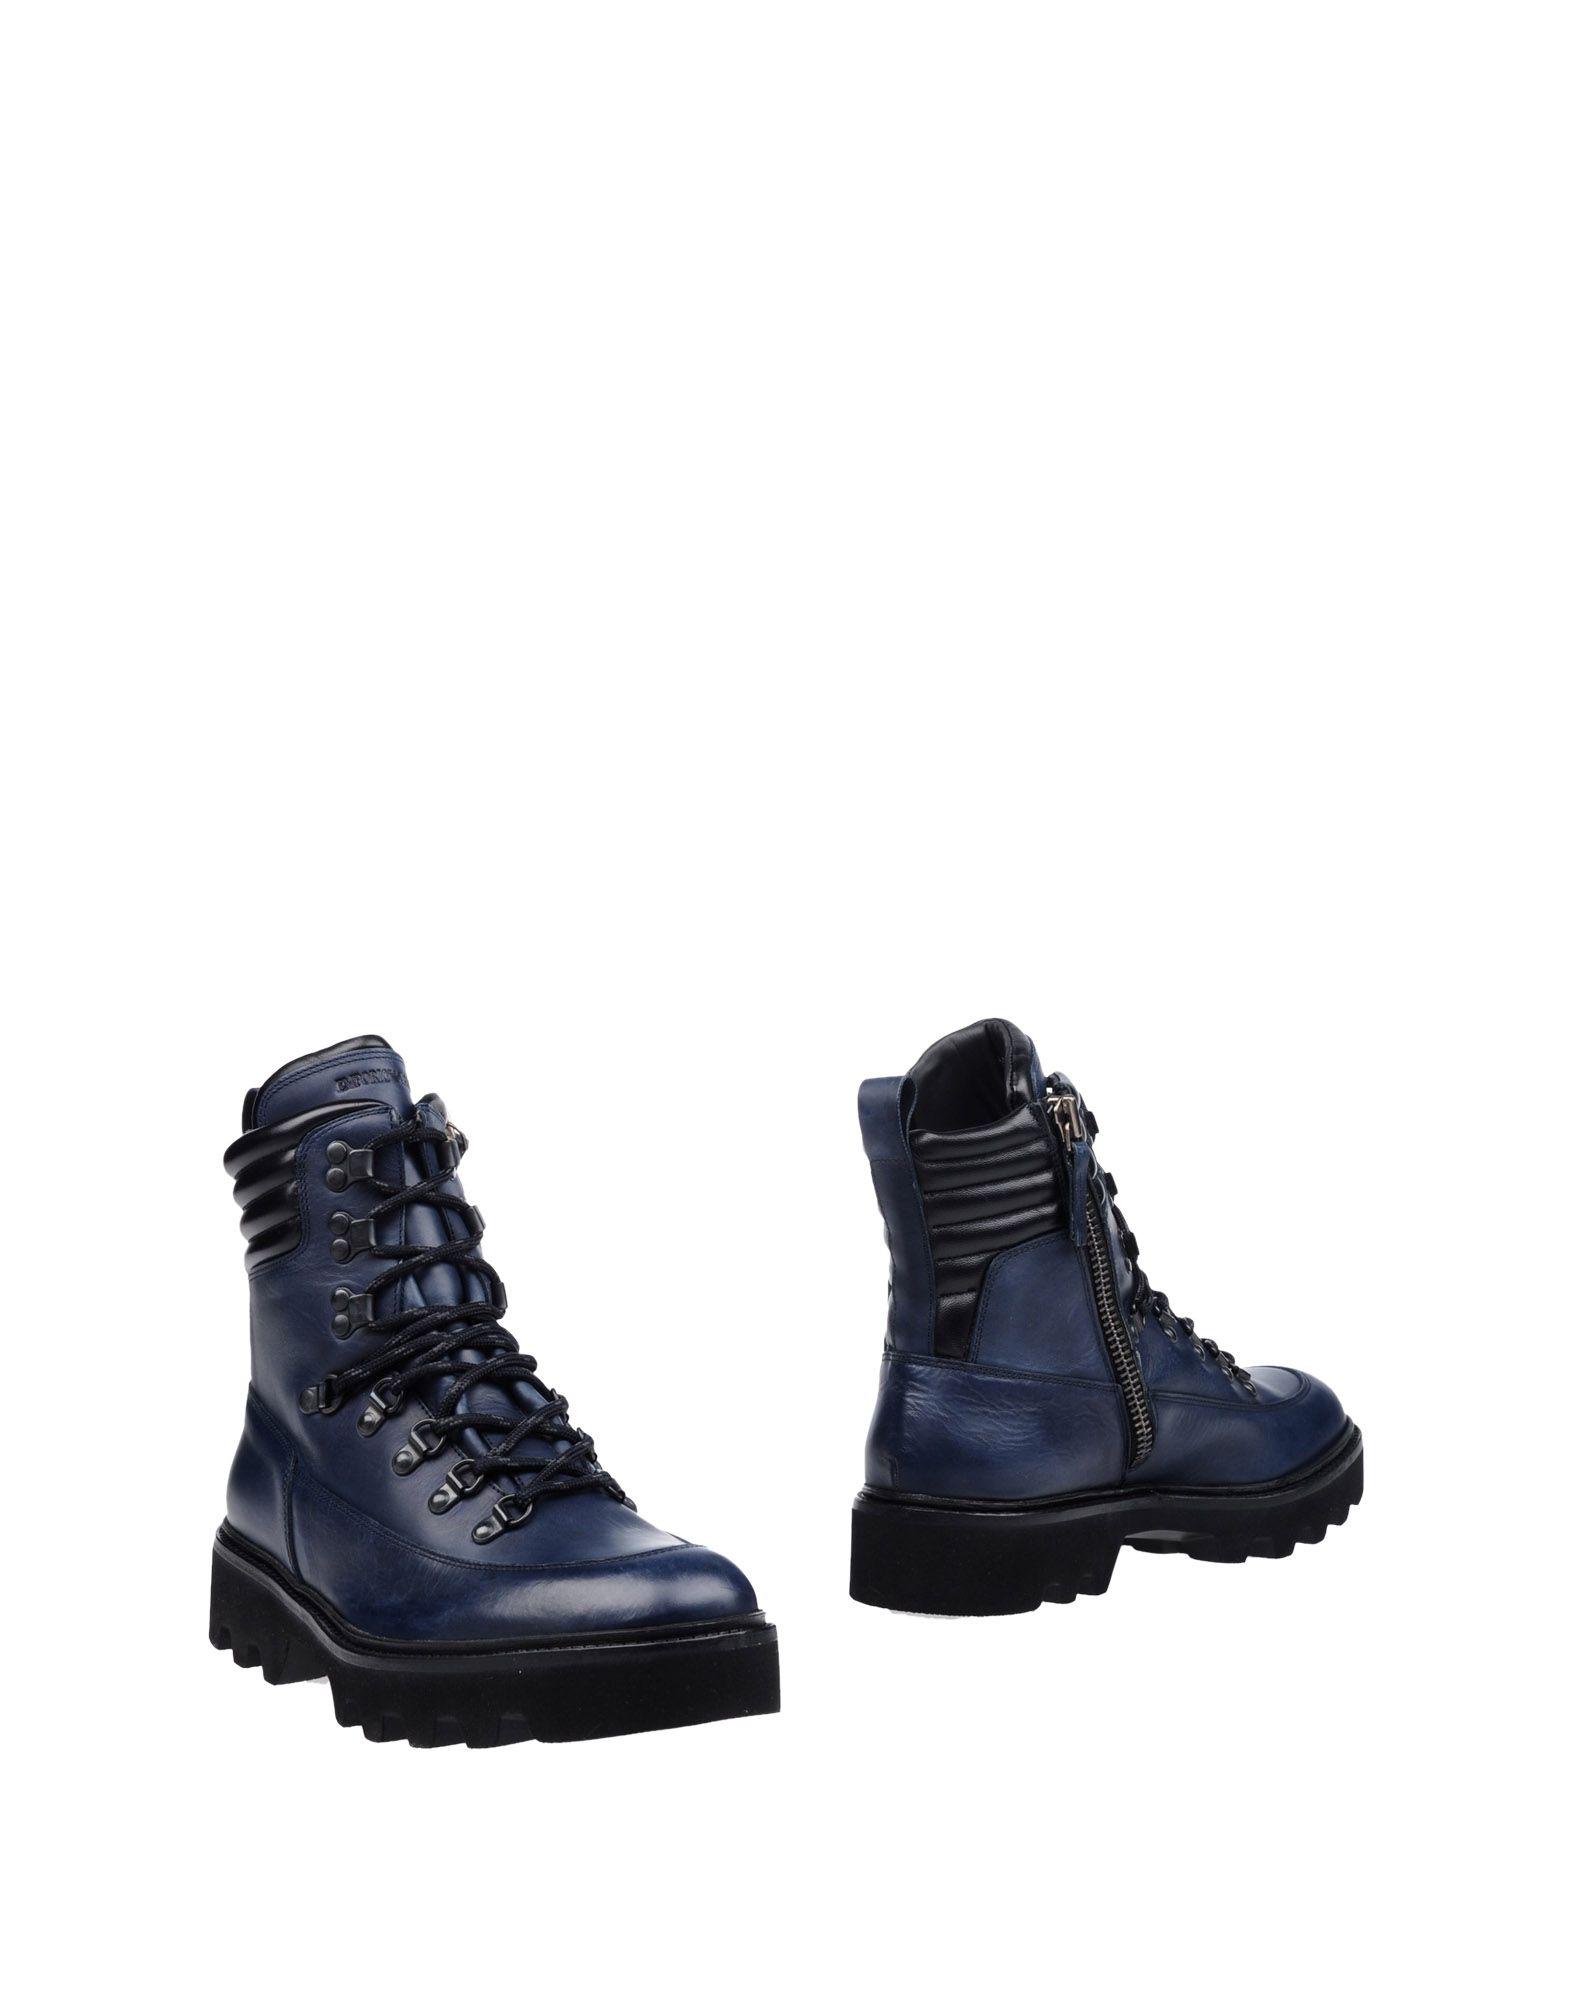 Emporio Emporio Emporio Armani Stiefelette Herren  11283042DX Neue Schuhe 079f94